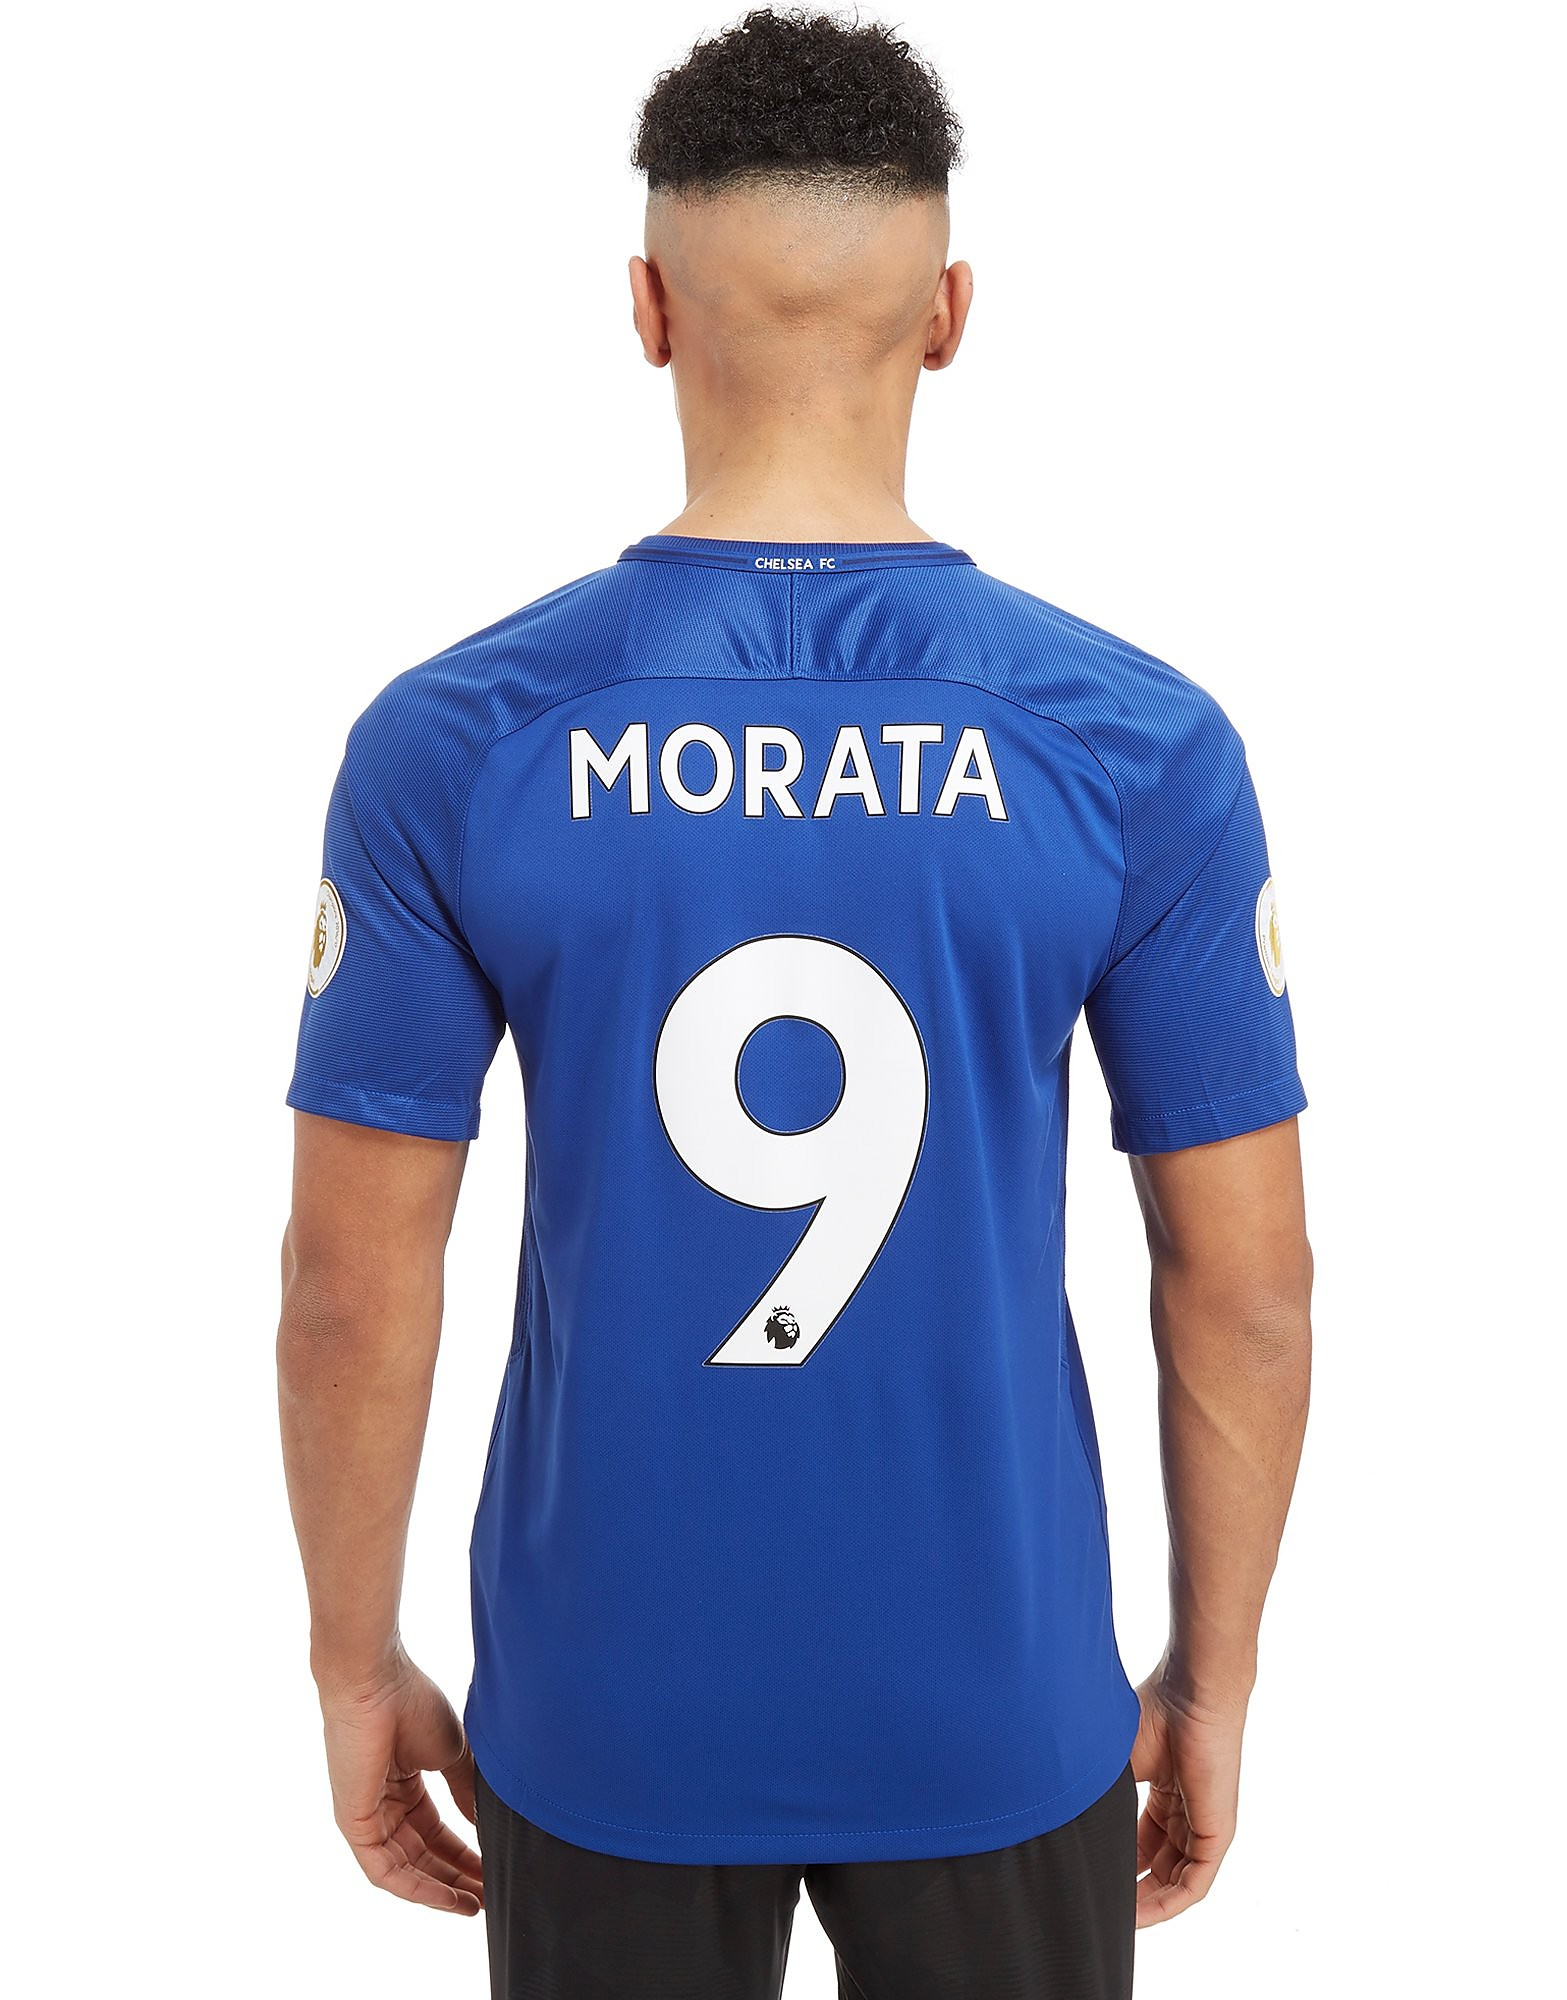 Nike Chelsea FC Home 2017 Morata #9 Shirt